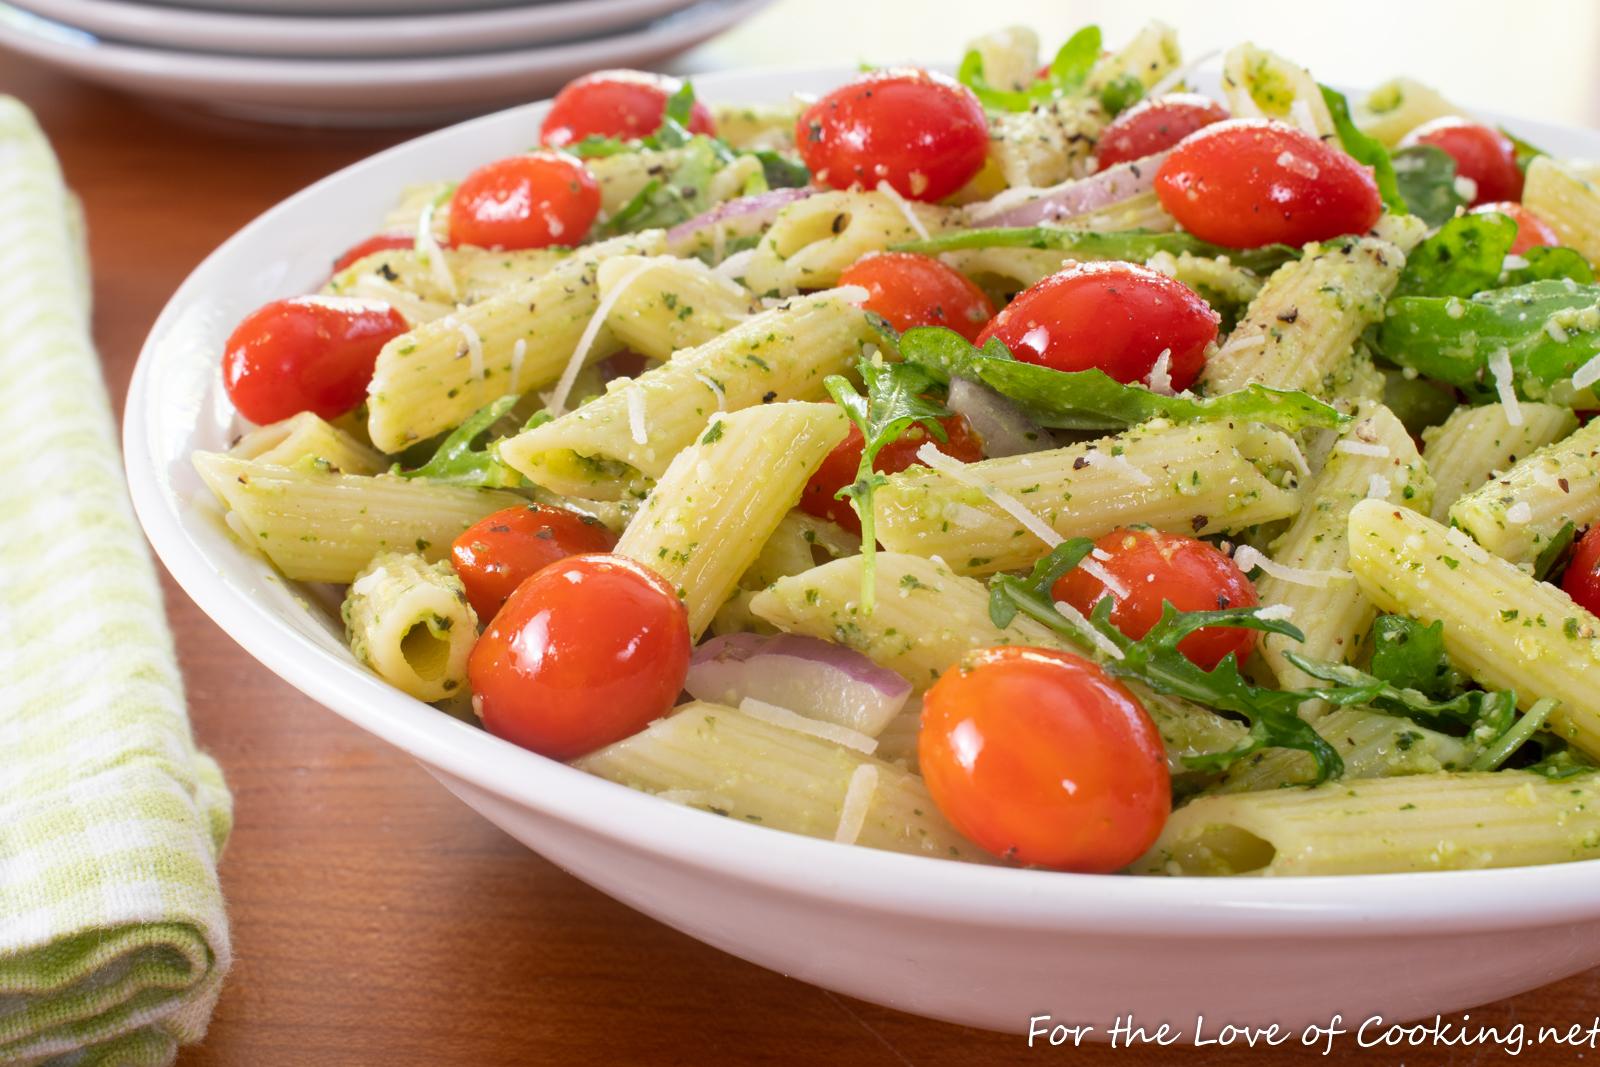 Pasta Salad with Blistered Tomatoes, Arugula, and Pesto